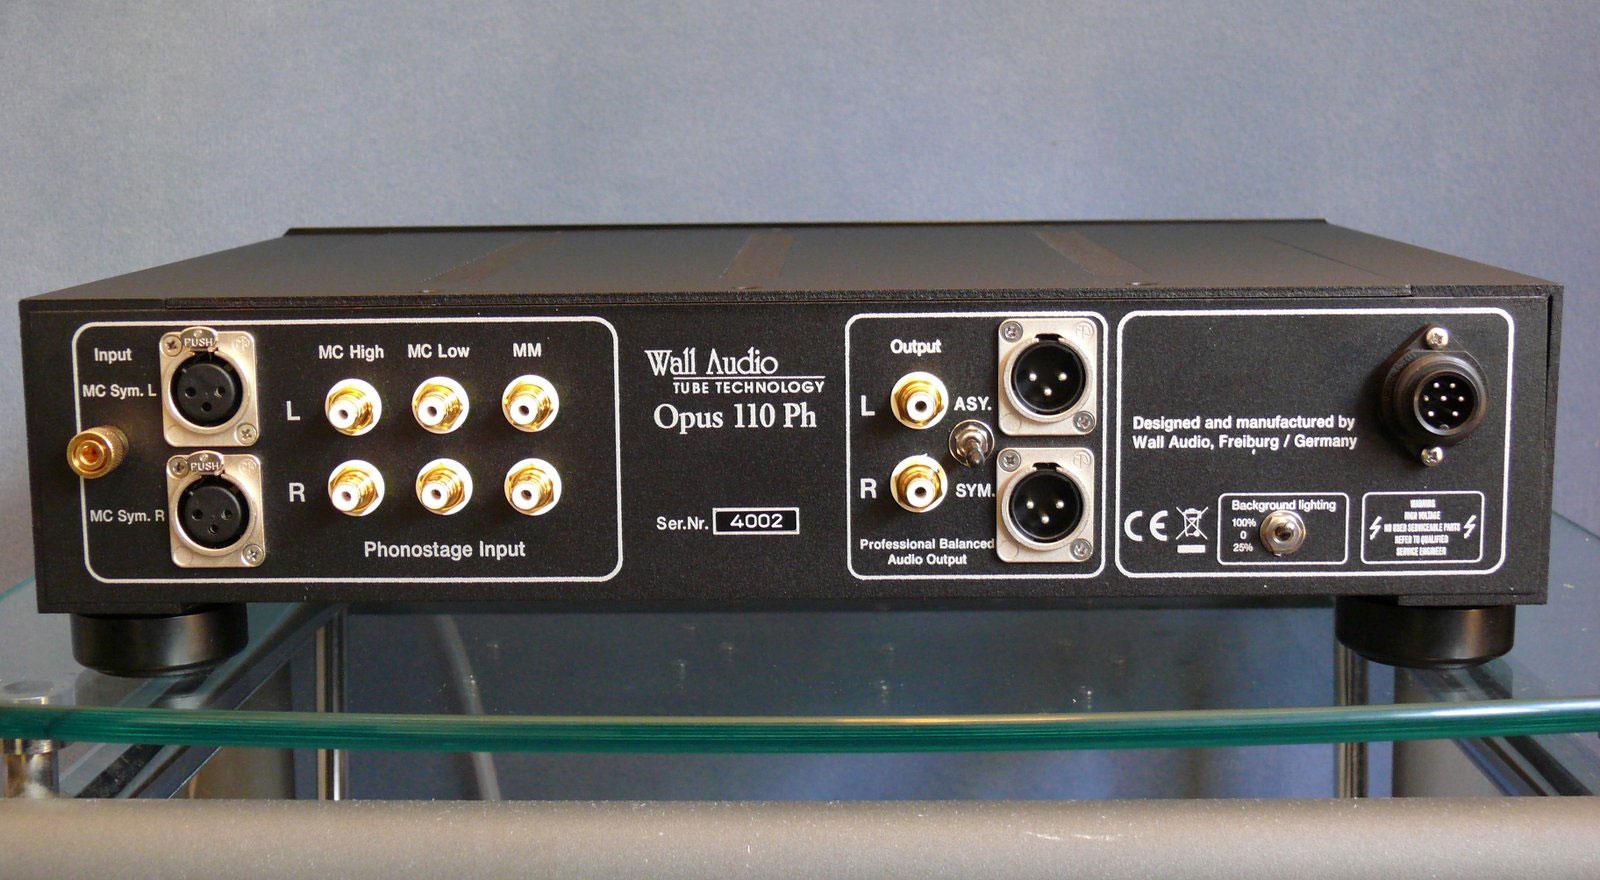 Wall Audio OPUS 110 PH